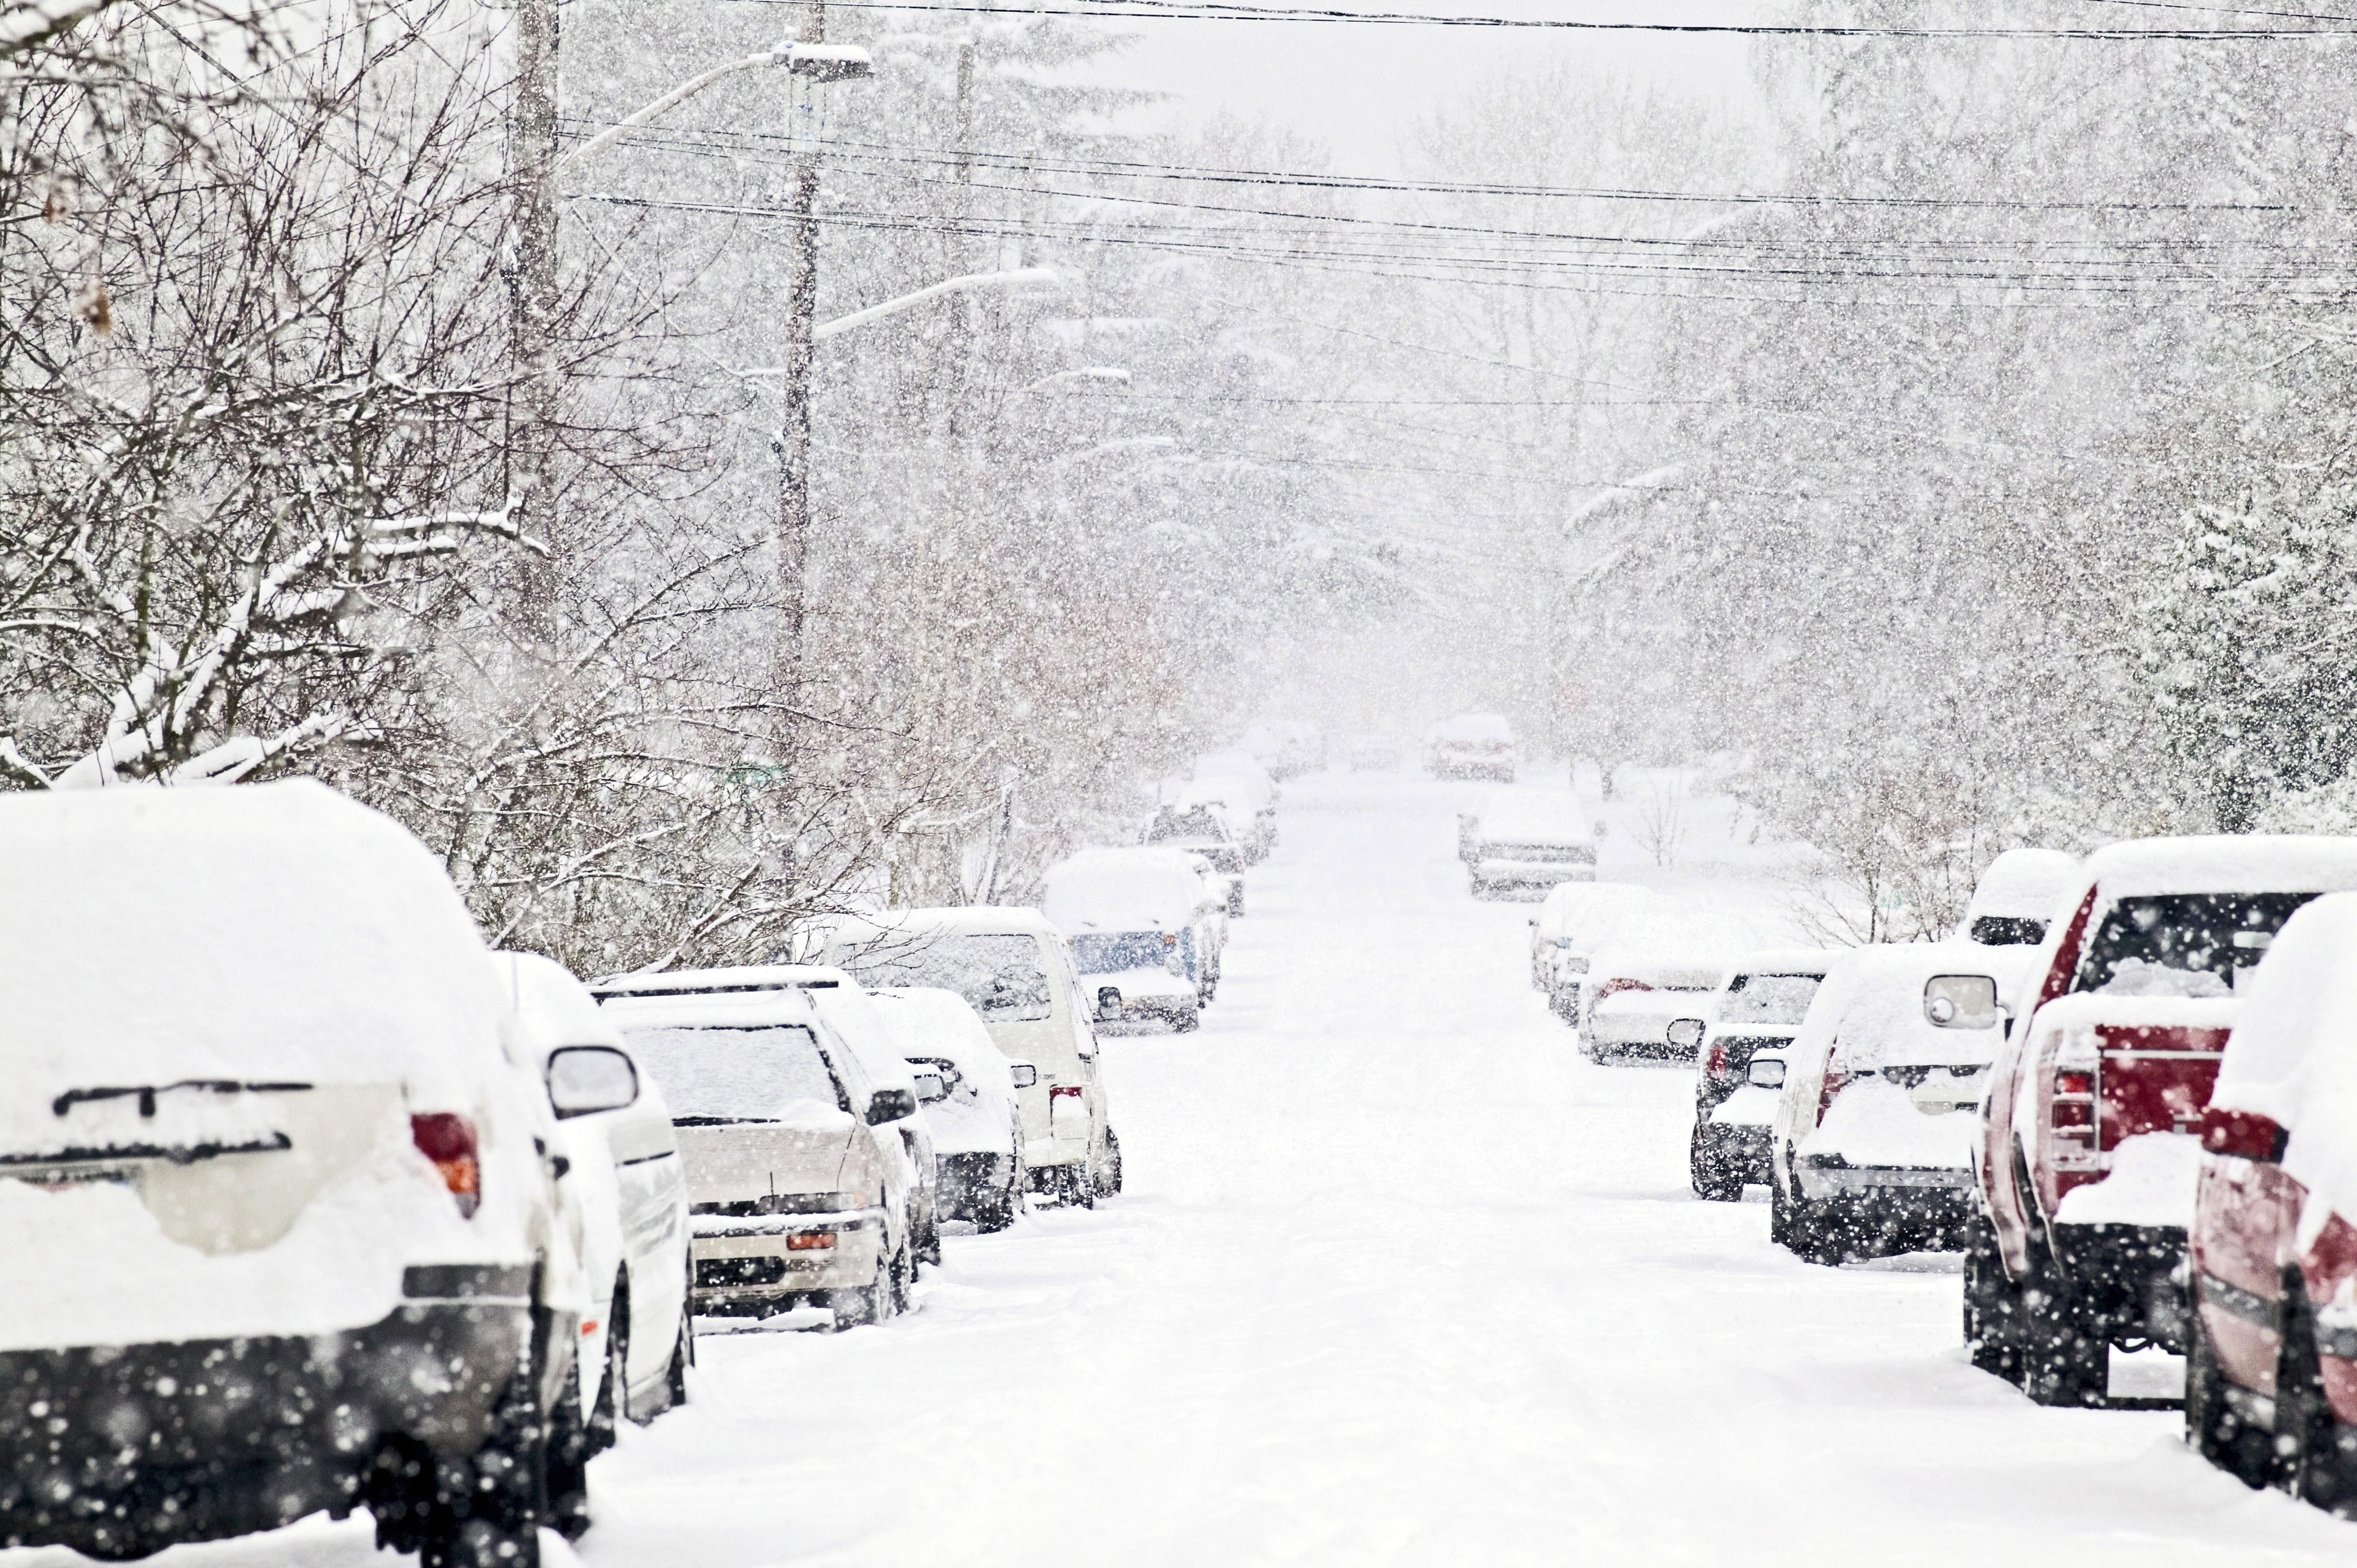 Wallpaper Snow Winter Street Snowfall In The City 3994x2657